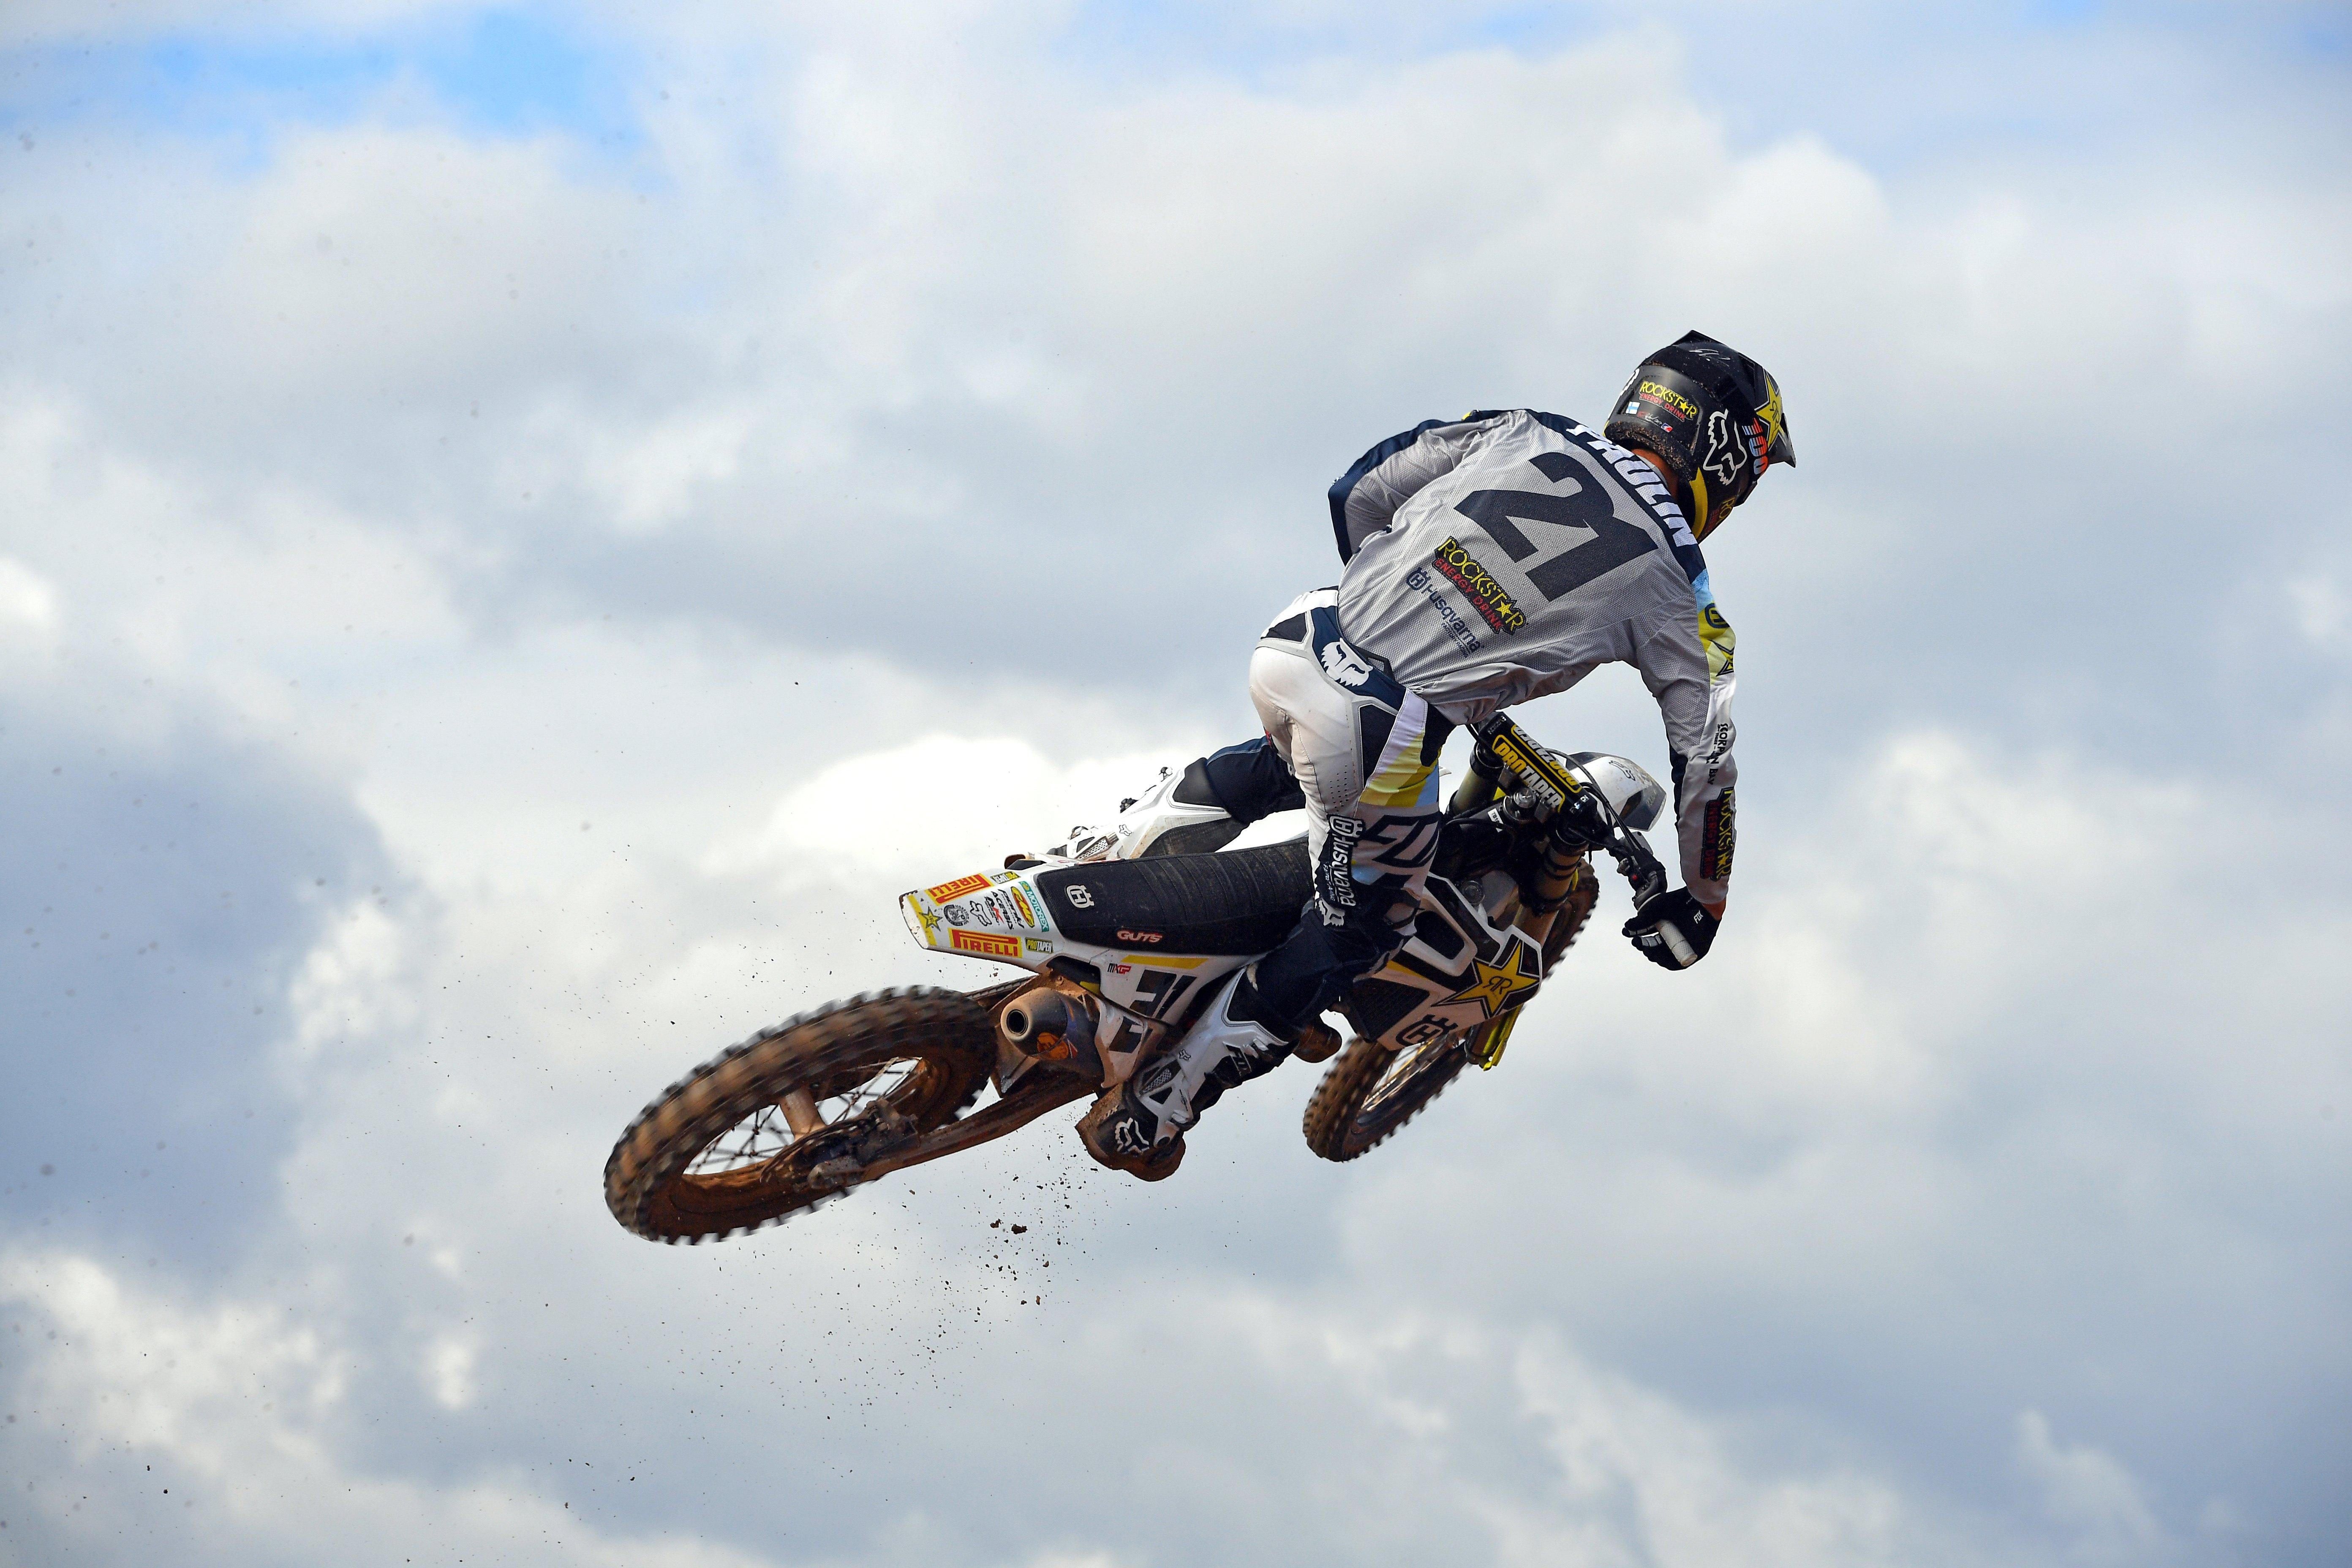 Max Anstie – Rockstar Energy Husqvarna Factory Racing